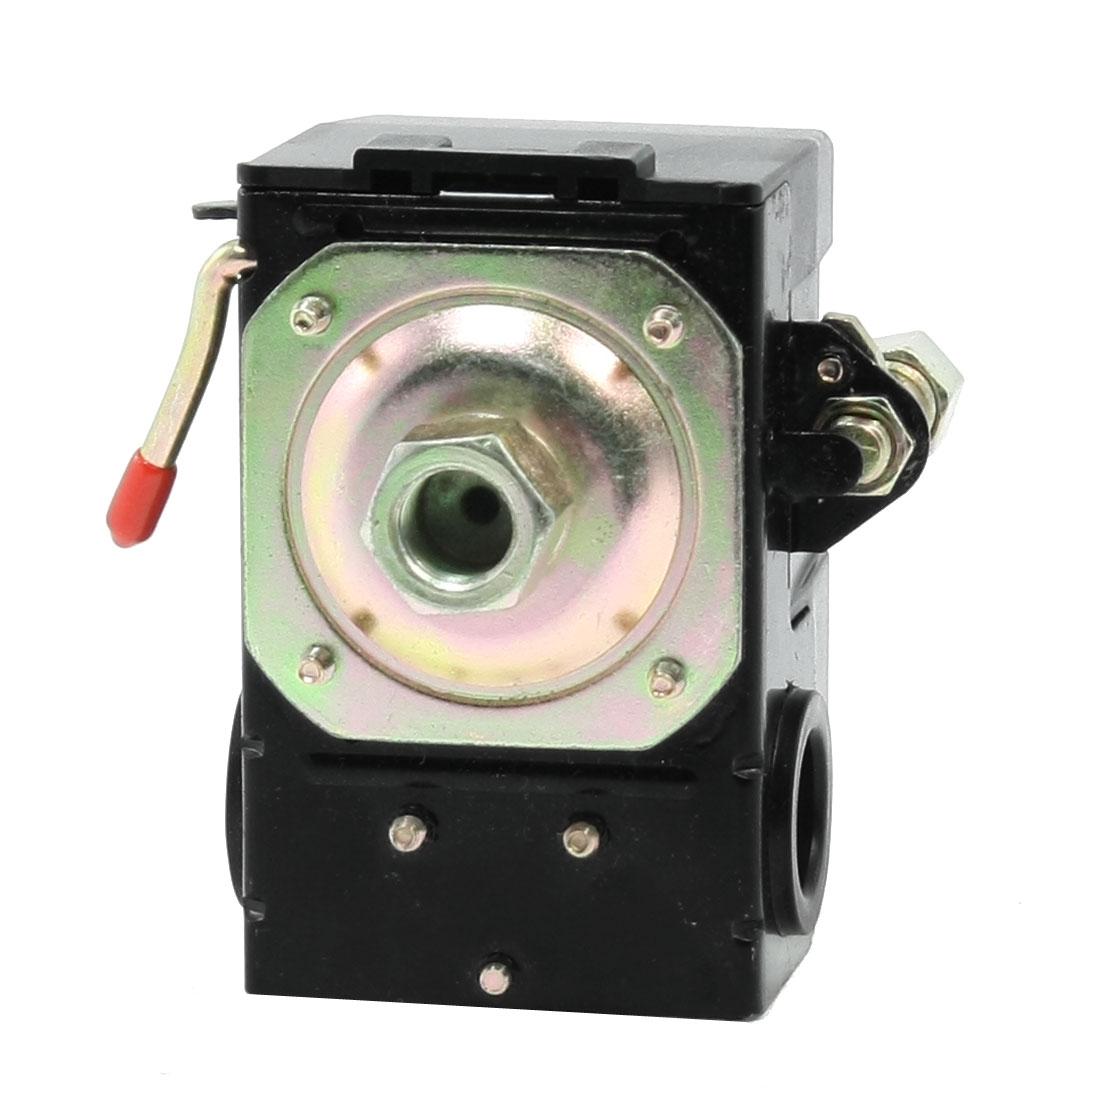 115PSI 1/4 NPT 1-Port Adjustable Air Compressor Pressure Switch Control Valve